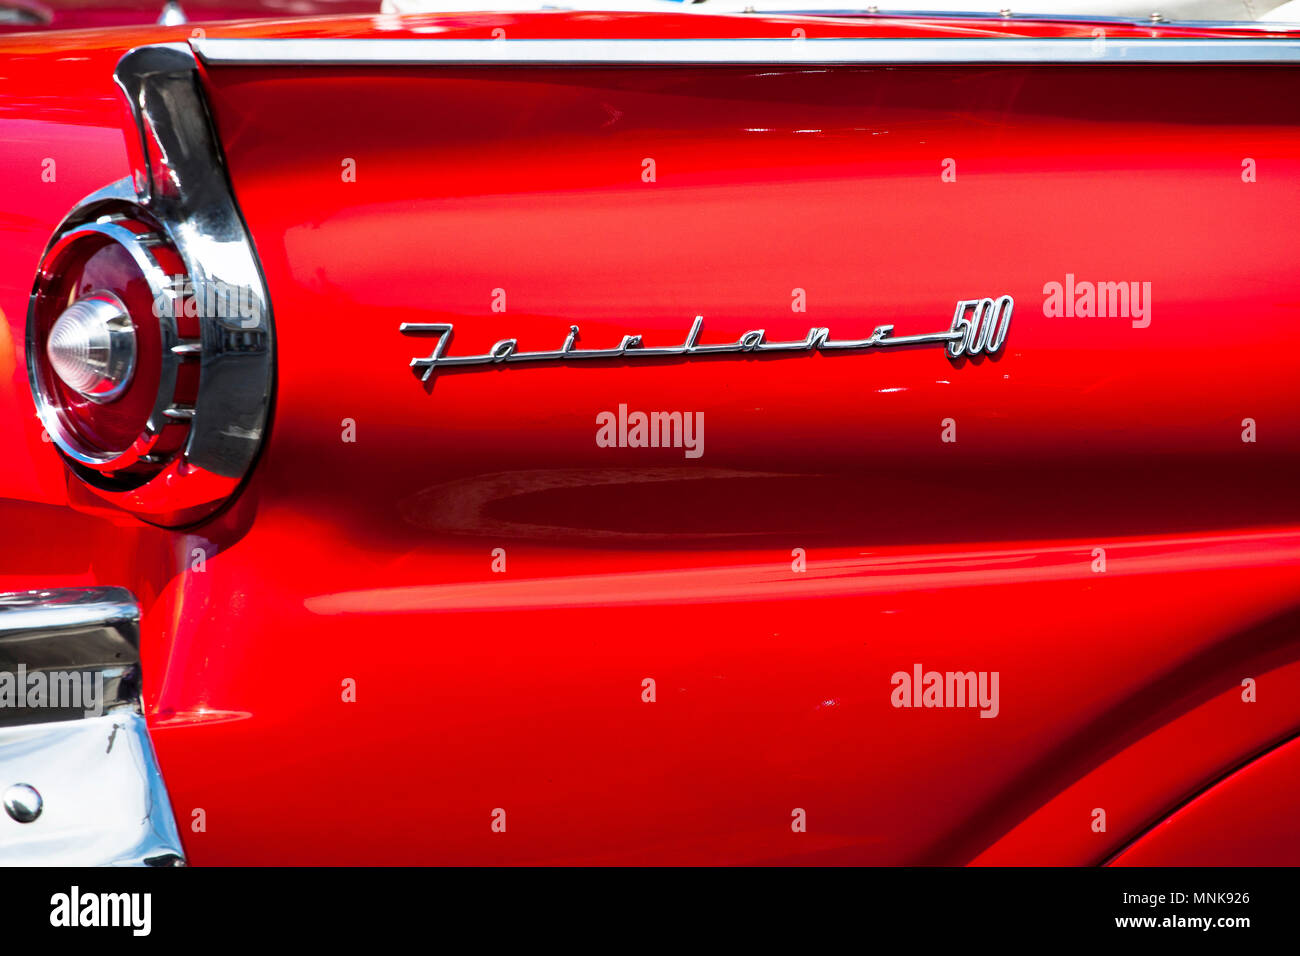 Cuba: rear wing, rear fender of a Fairlane 500 - Stock Image